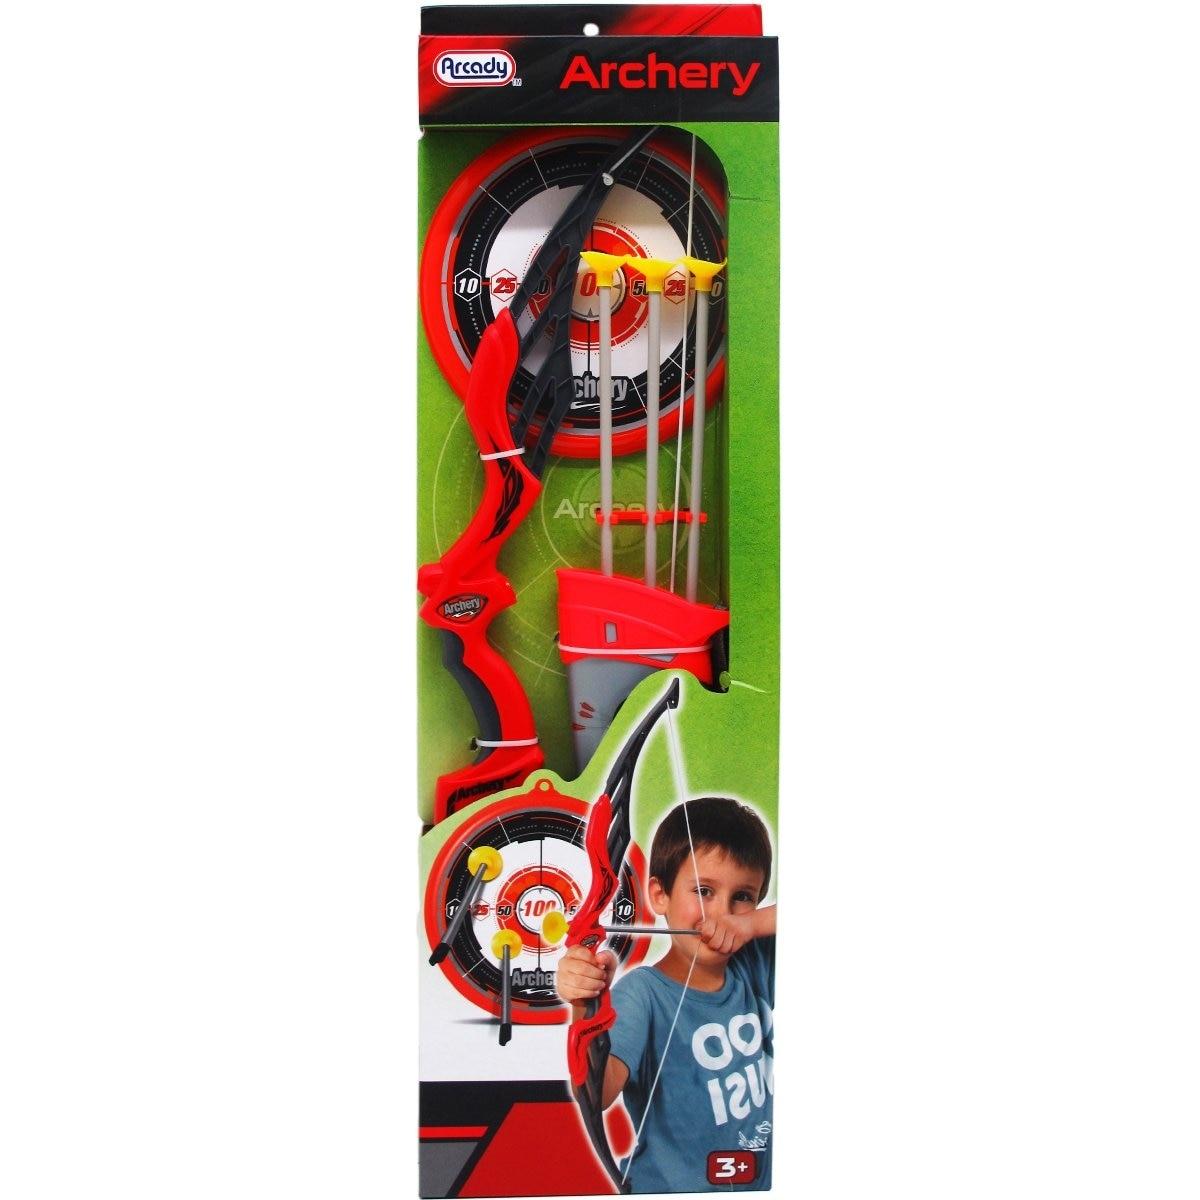 "26.25"" Super Archery Play Set with Arrow Case - 12 Units thumbnail"